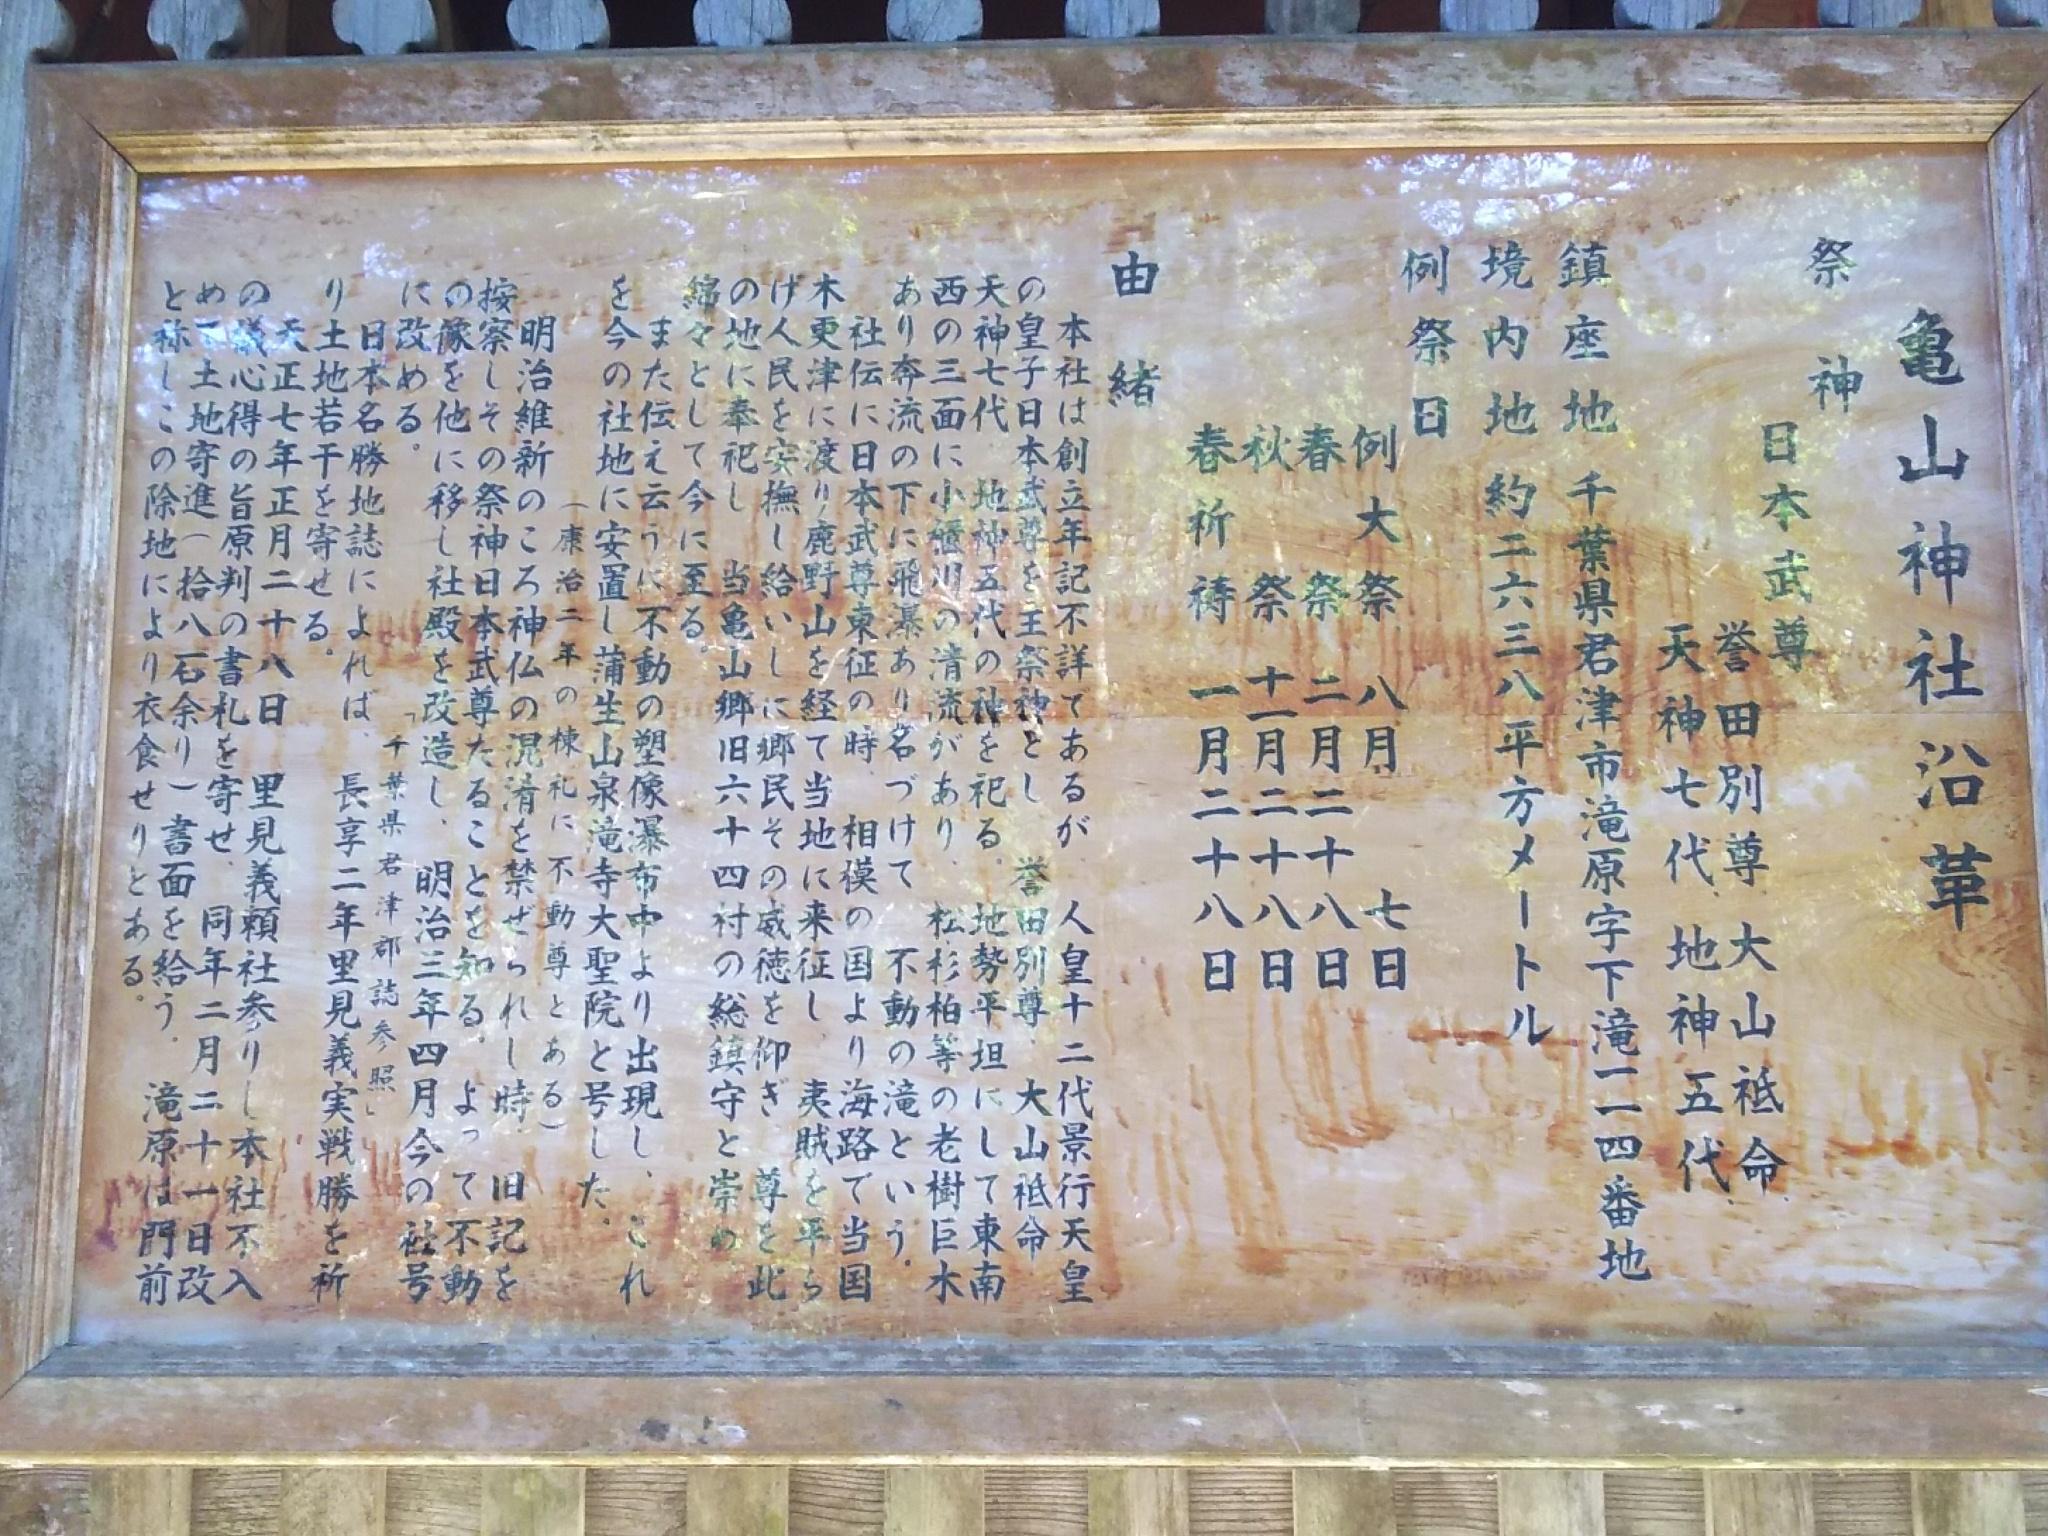 龜山神社の境内・文化財